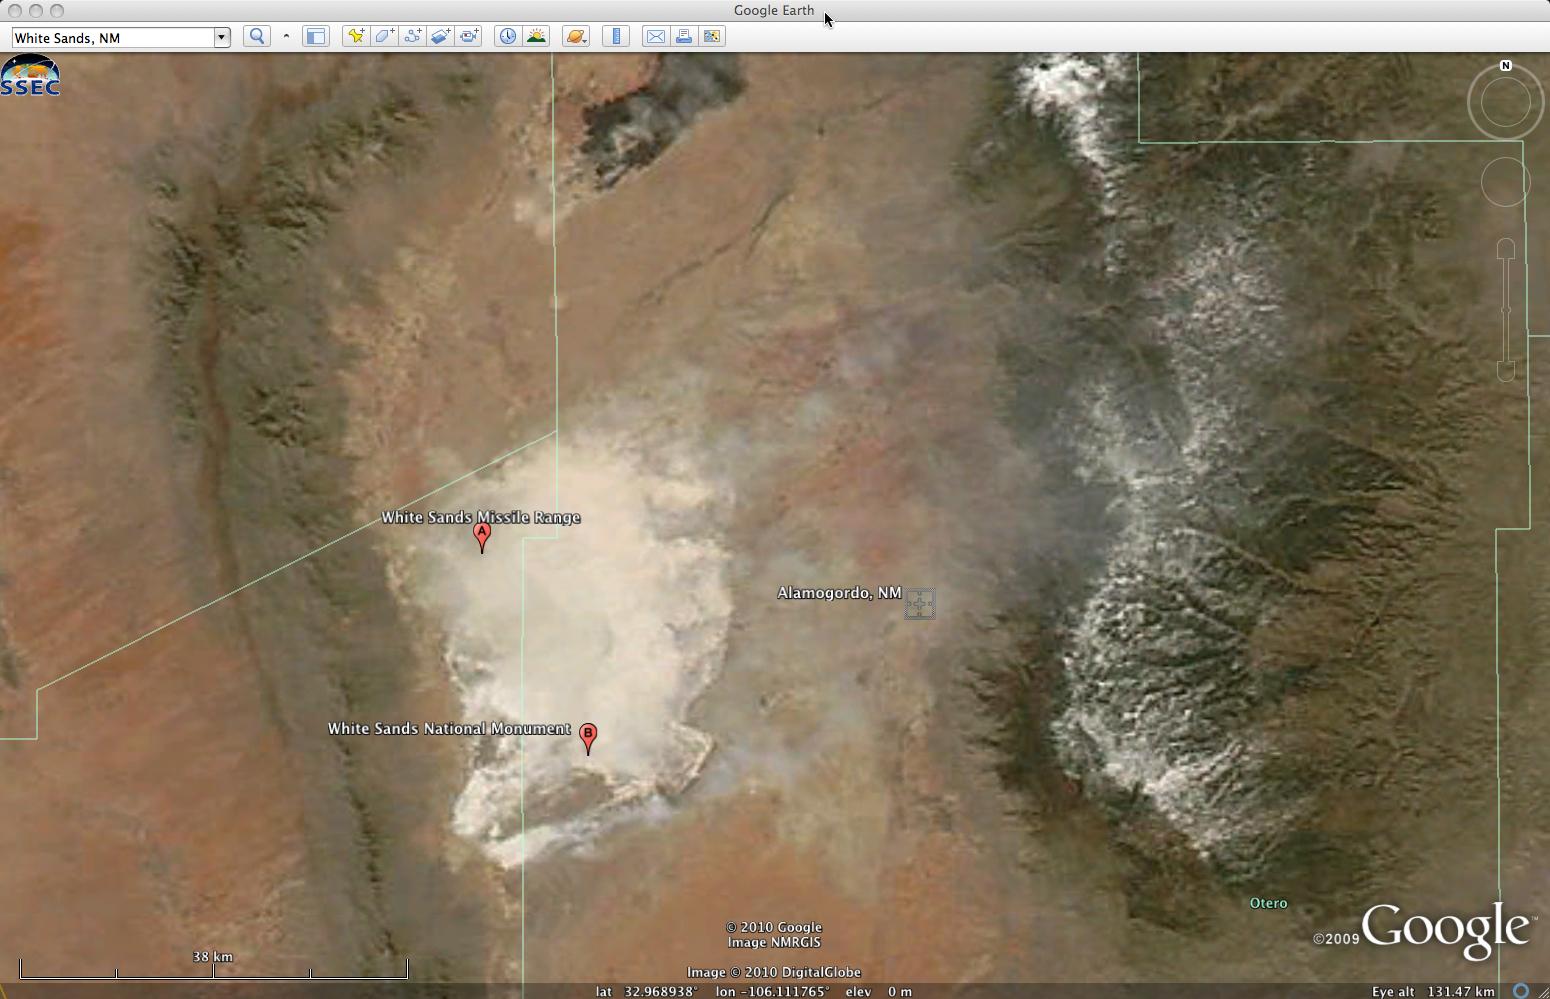 Aqua MODIS true color image (viewed using Google Earth)